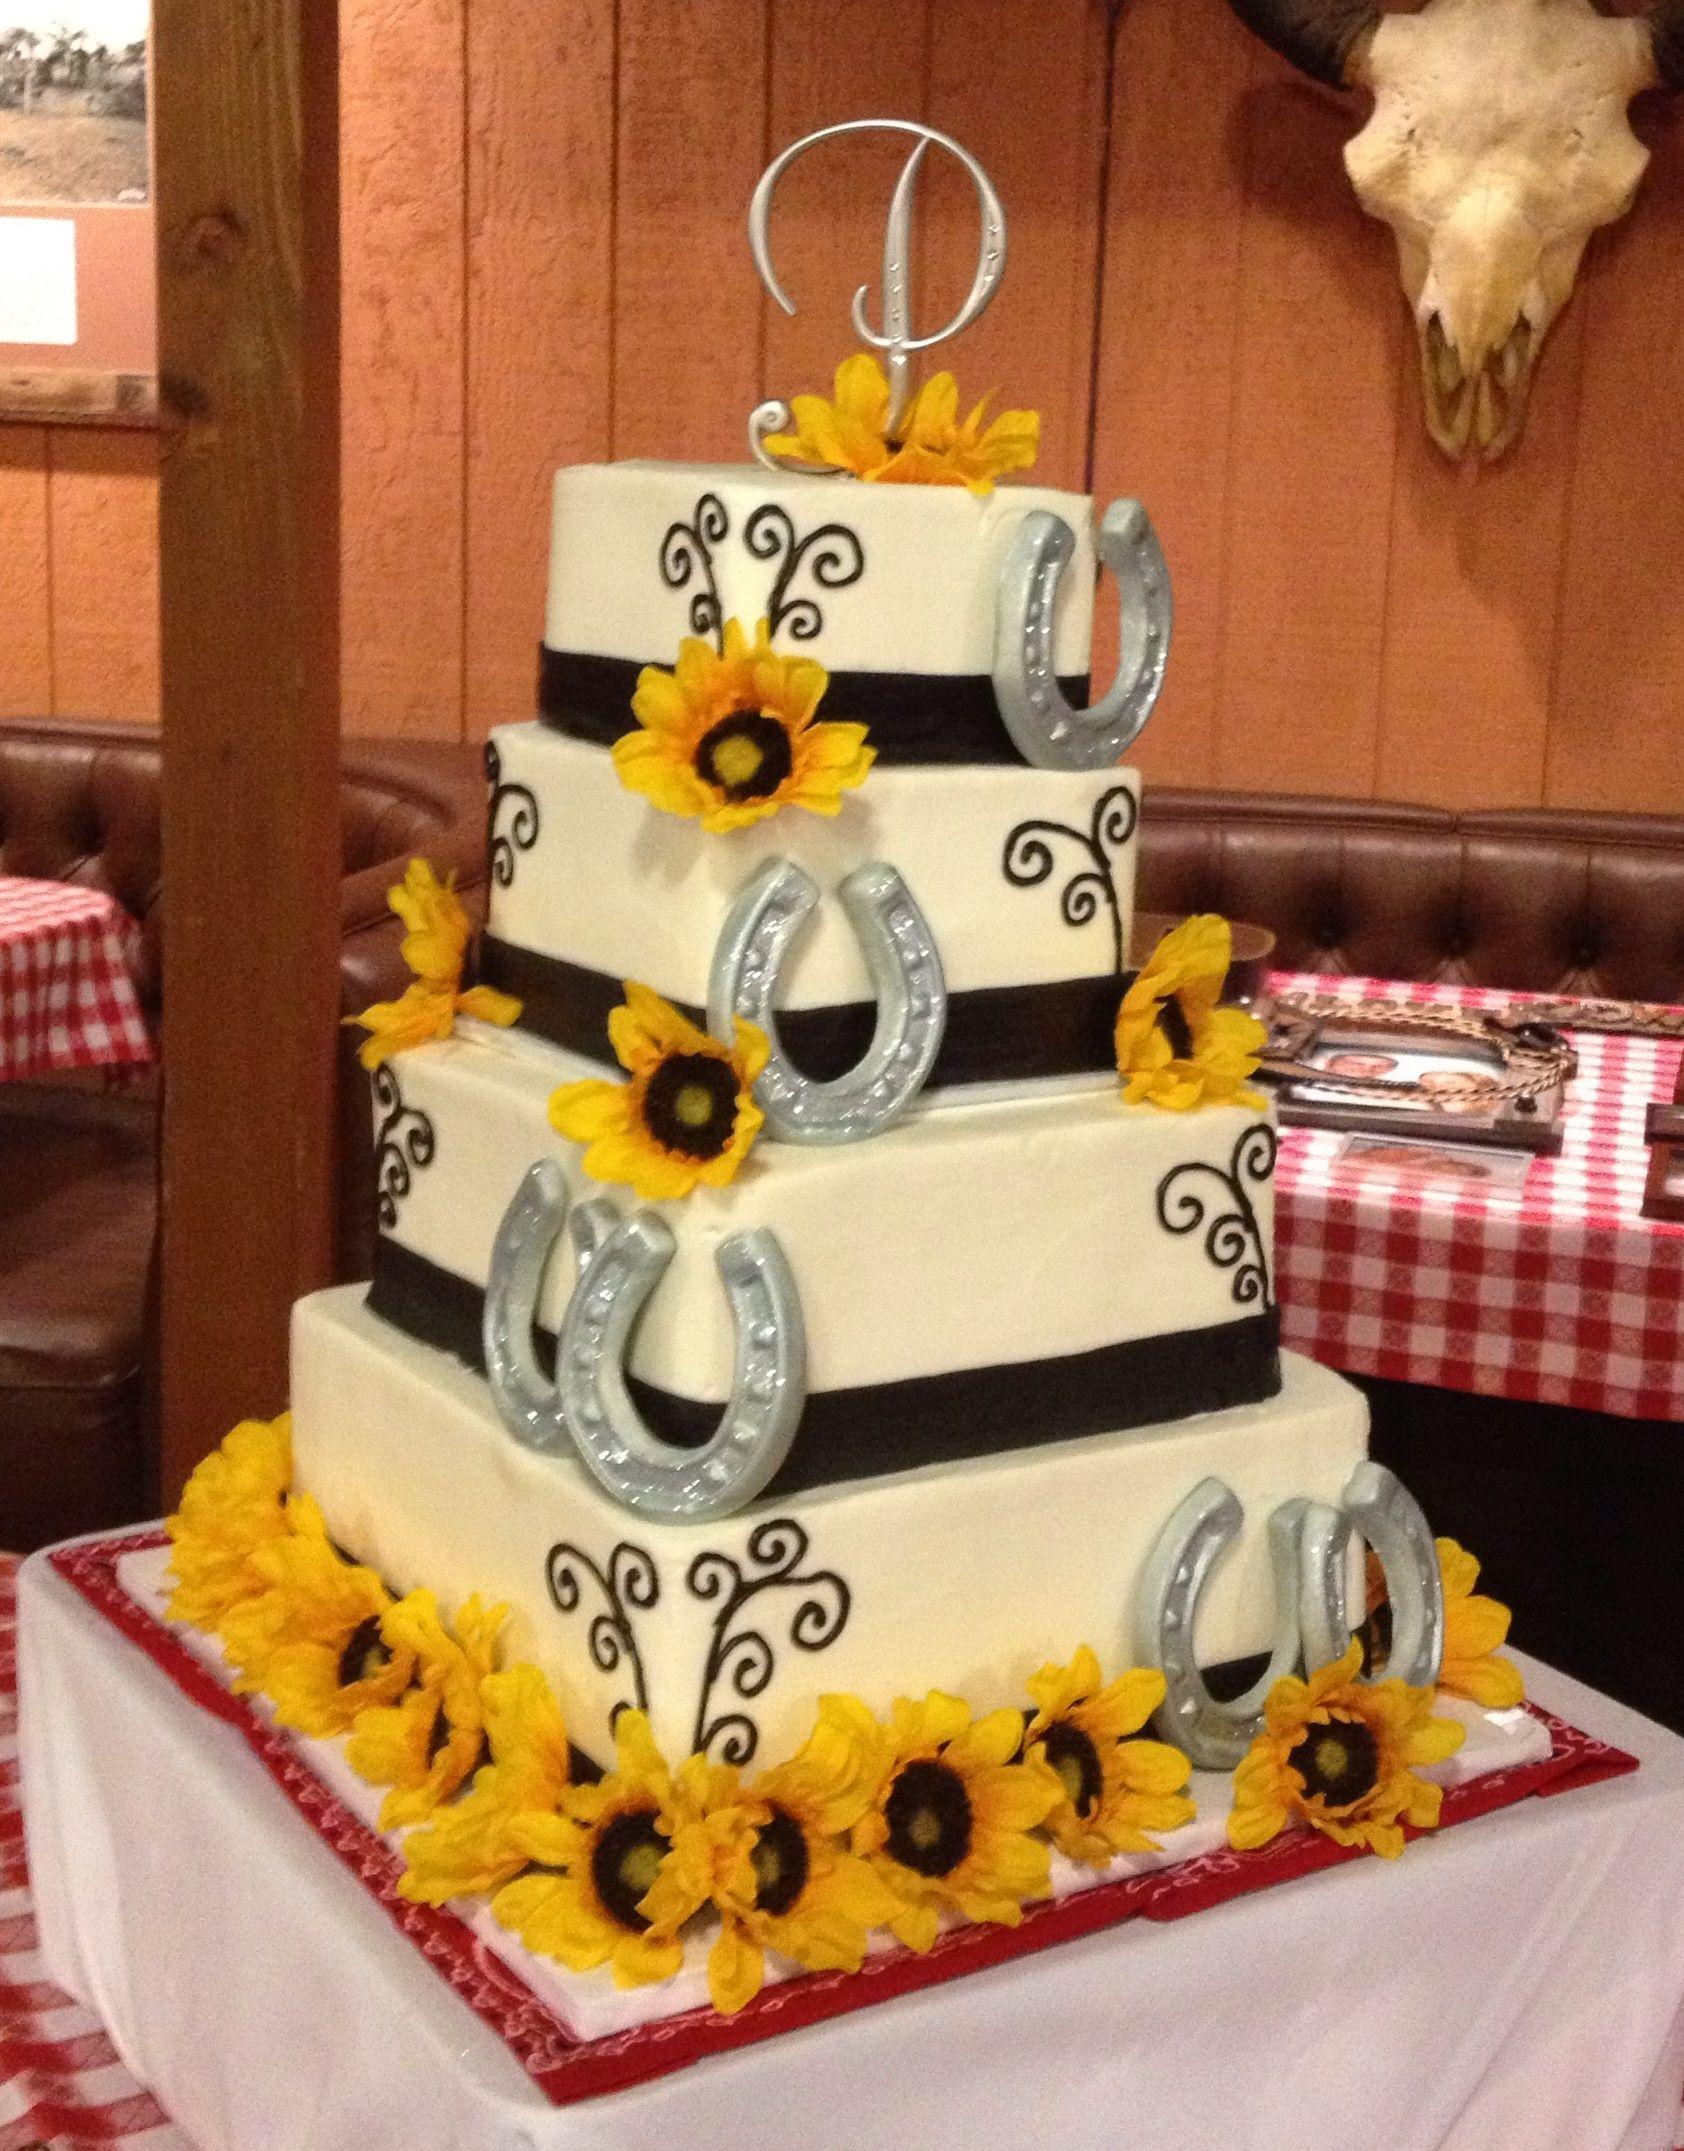 Western Wedding Cake e the idea but with orange